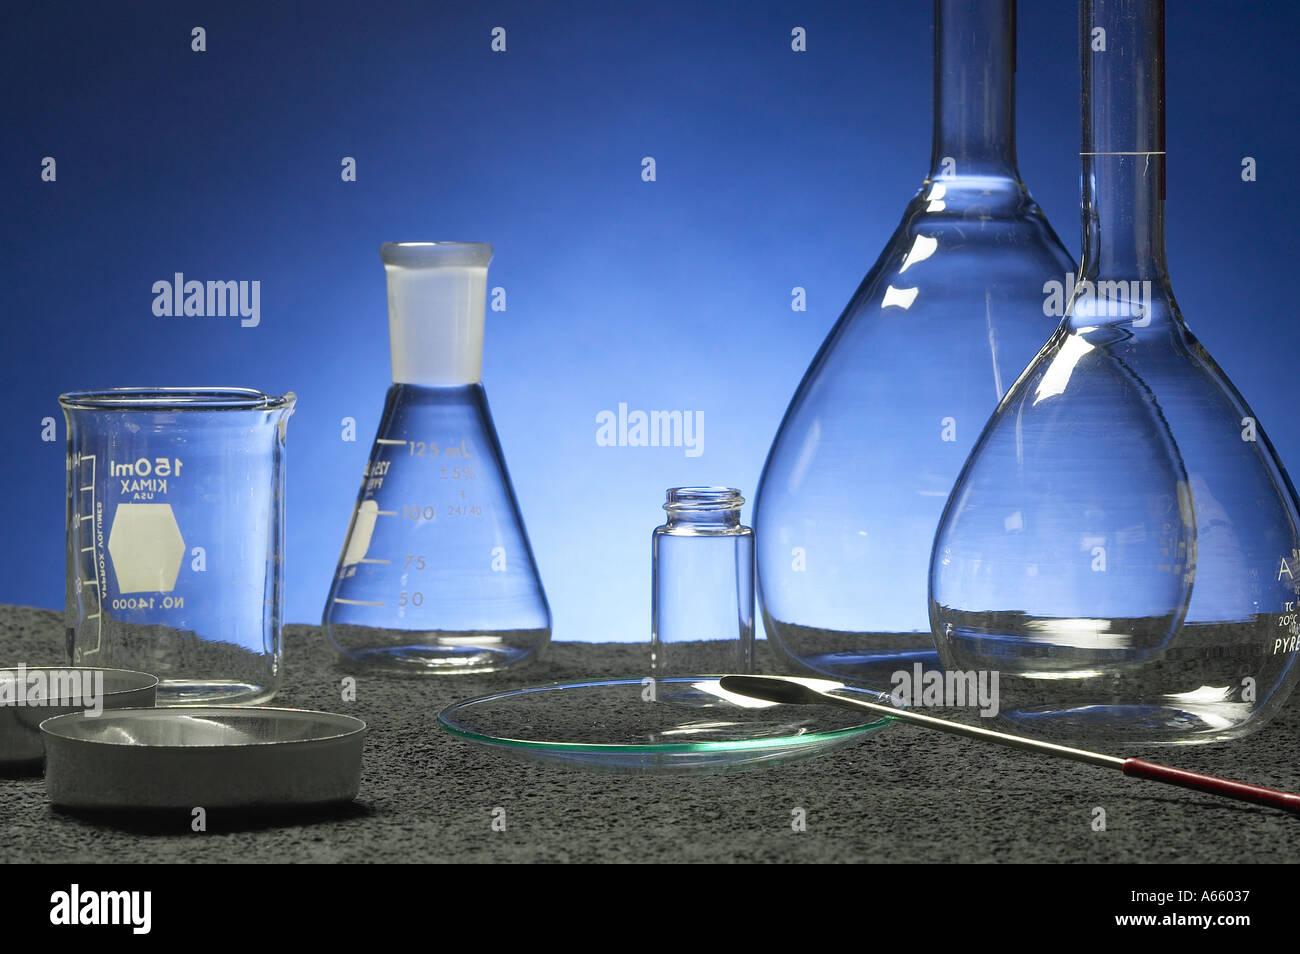 Clean Empty Chemistry Lab Beakers - Stock Image